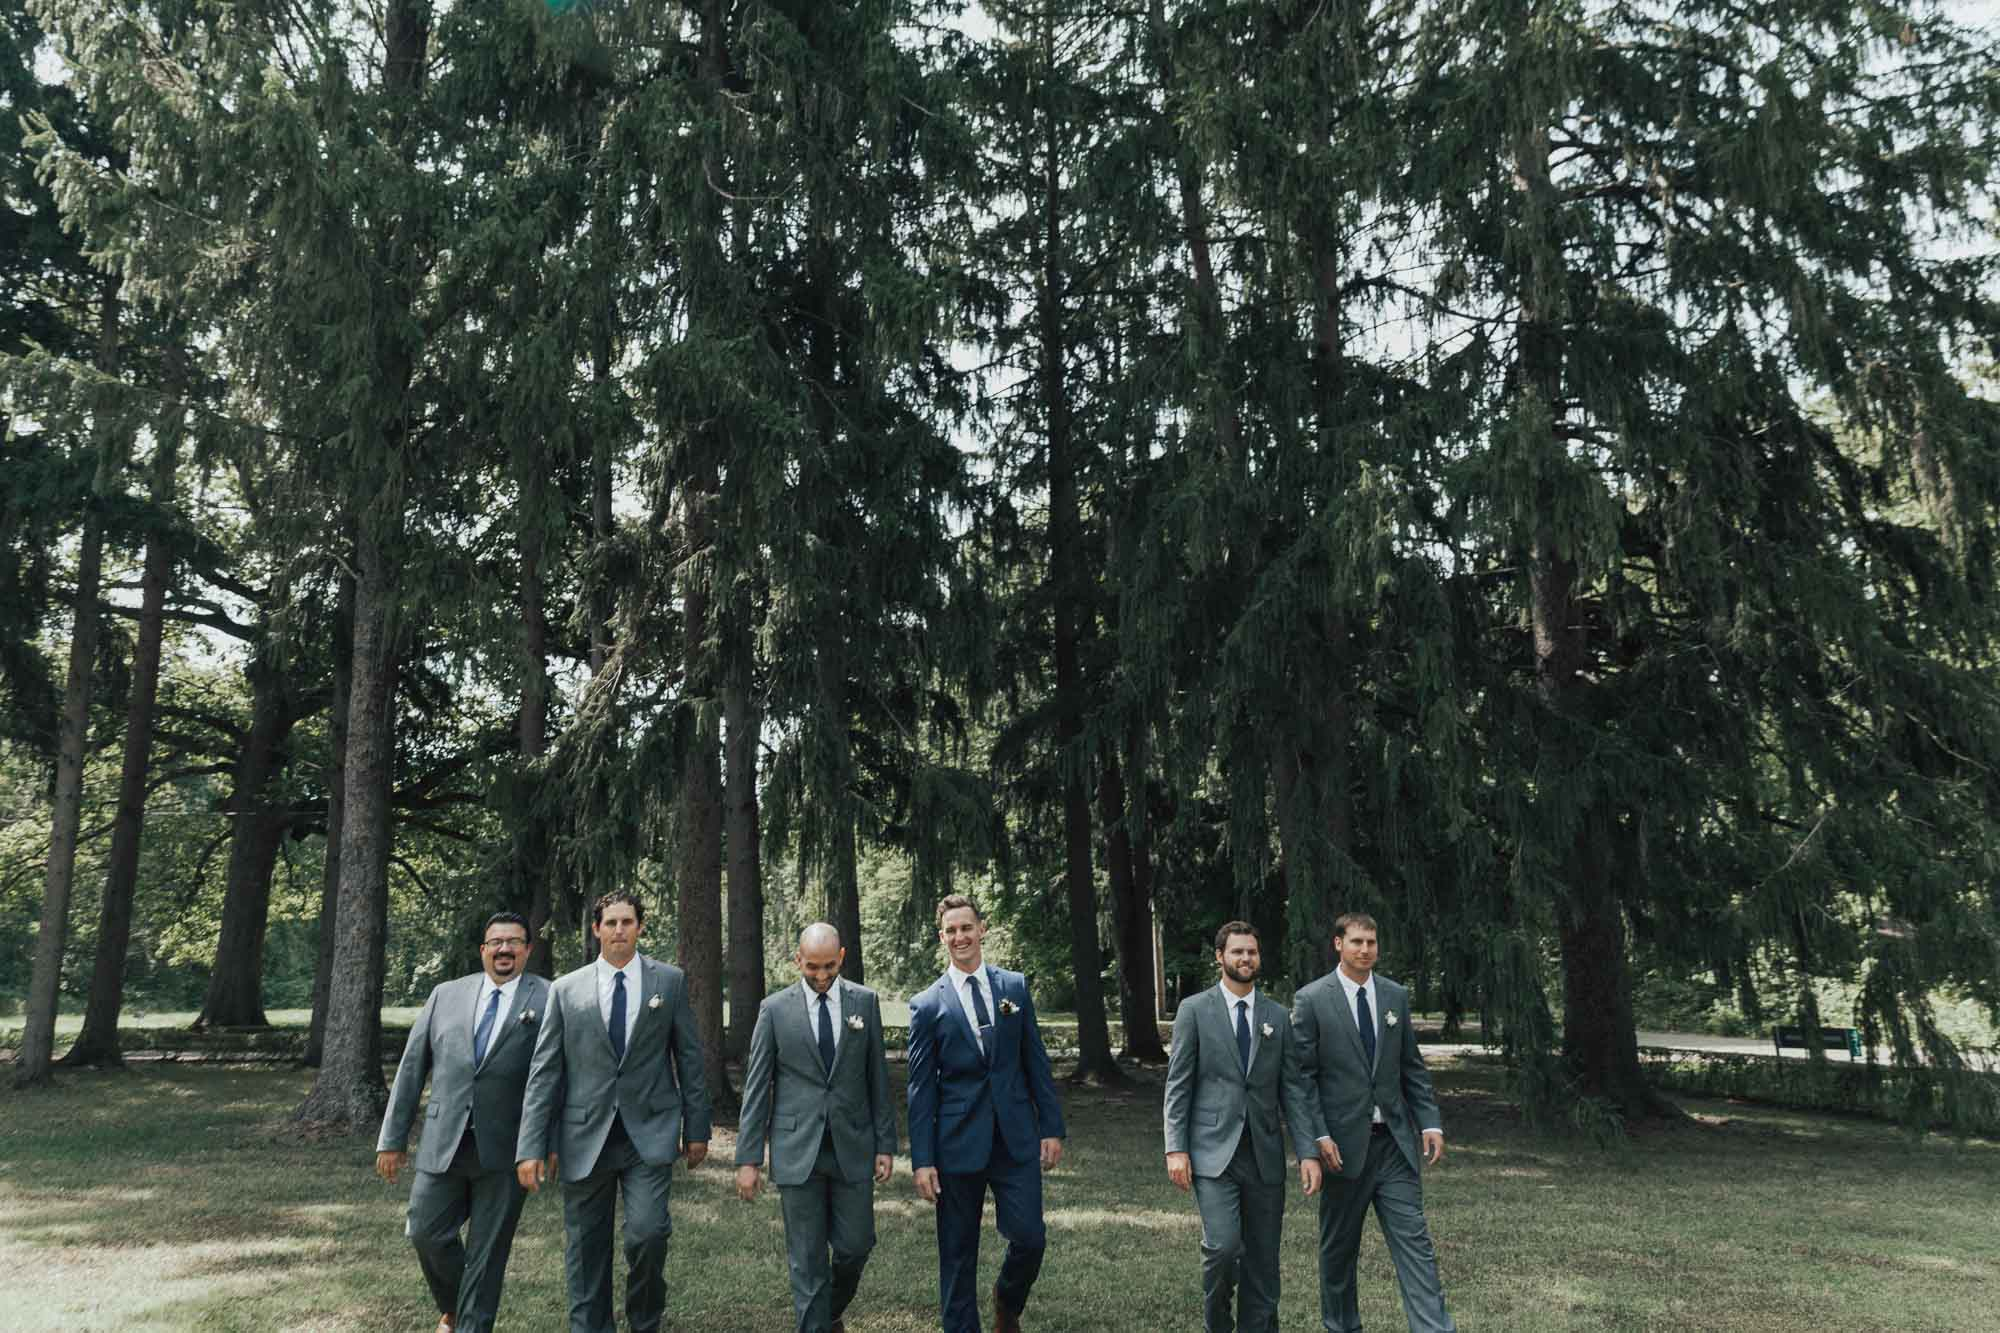 champaign_il_wedding_photography-0136.jpg